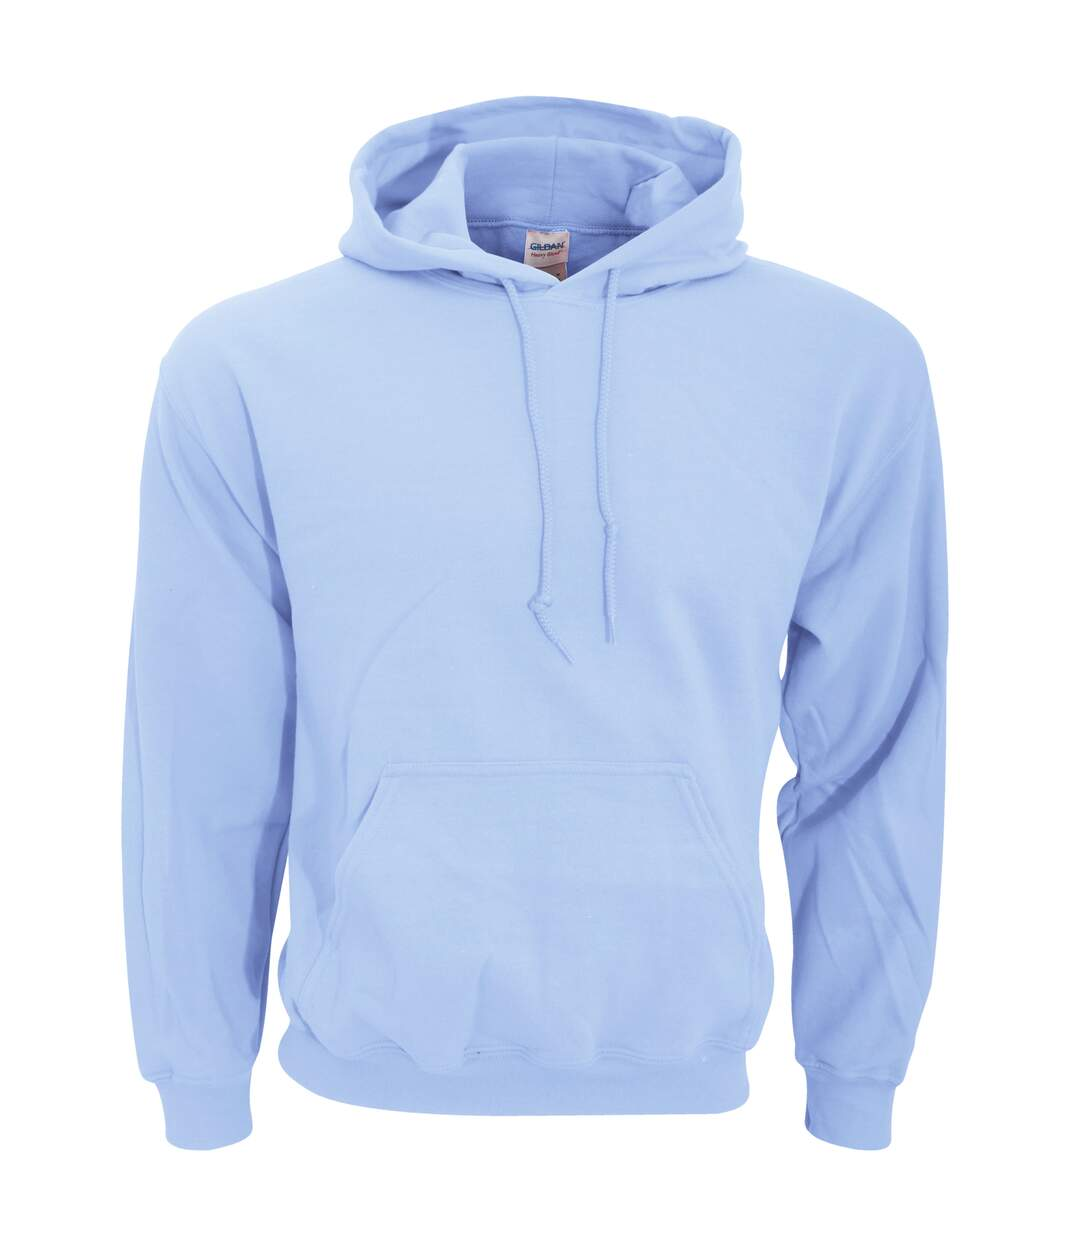 Gildan Heavy Blend Adult Unisex Hooded Sweatshirt / Hoodie (Legion Blue) - UTBC468